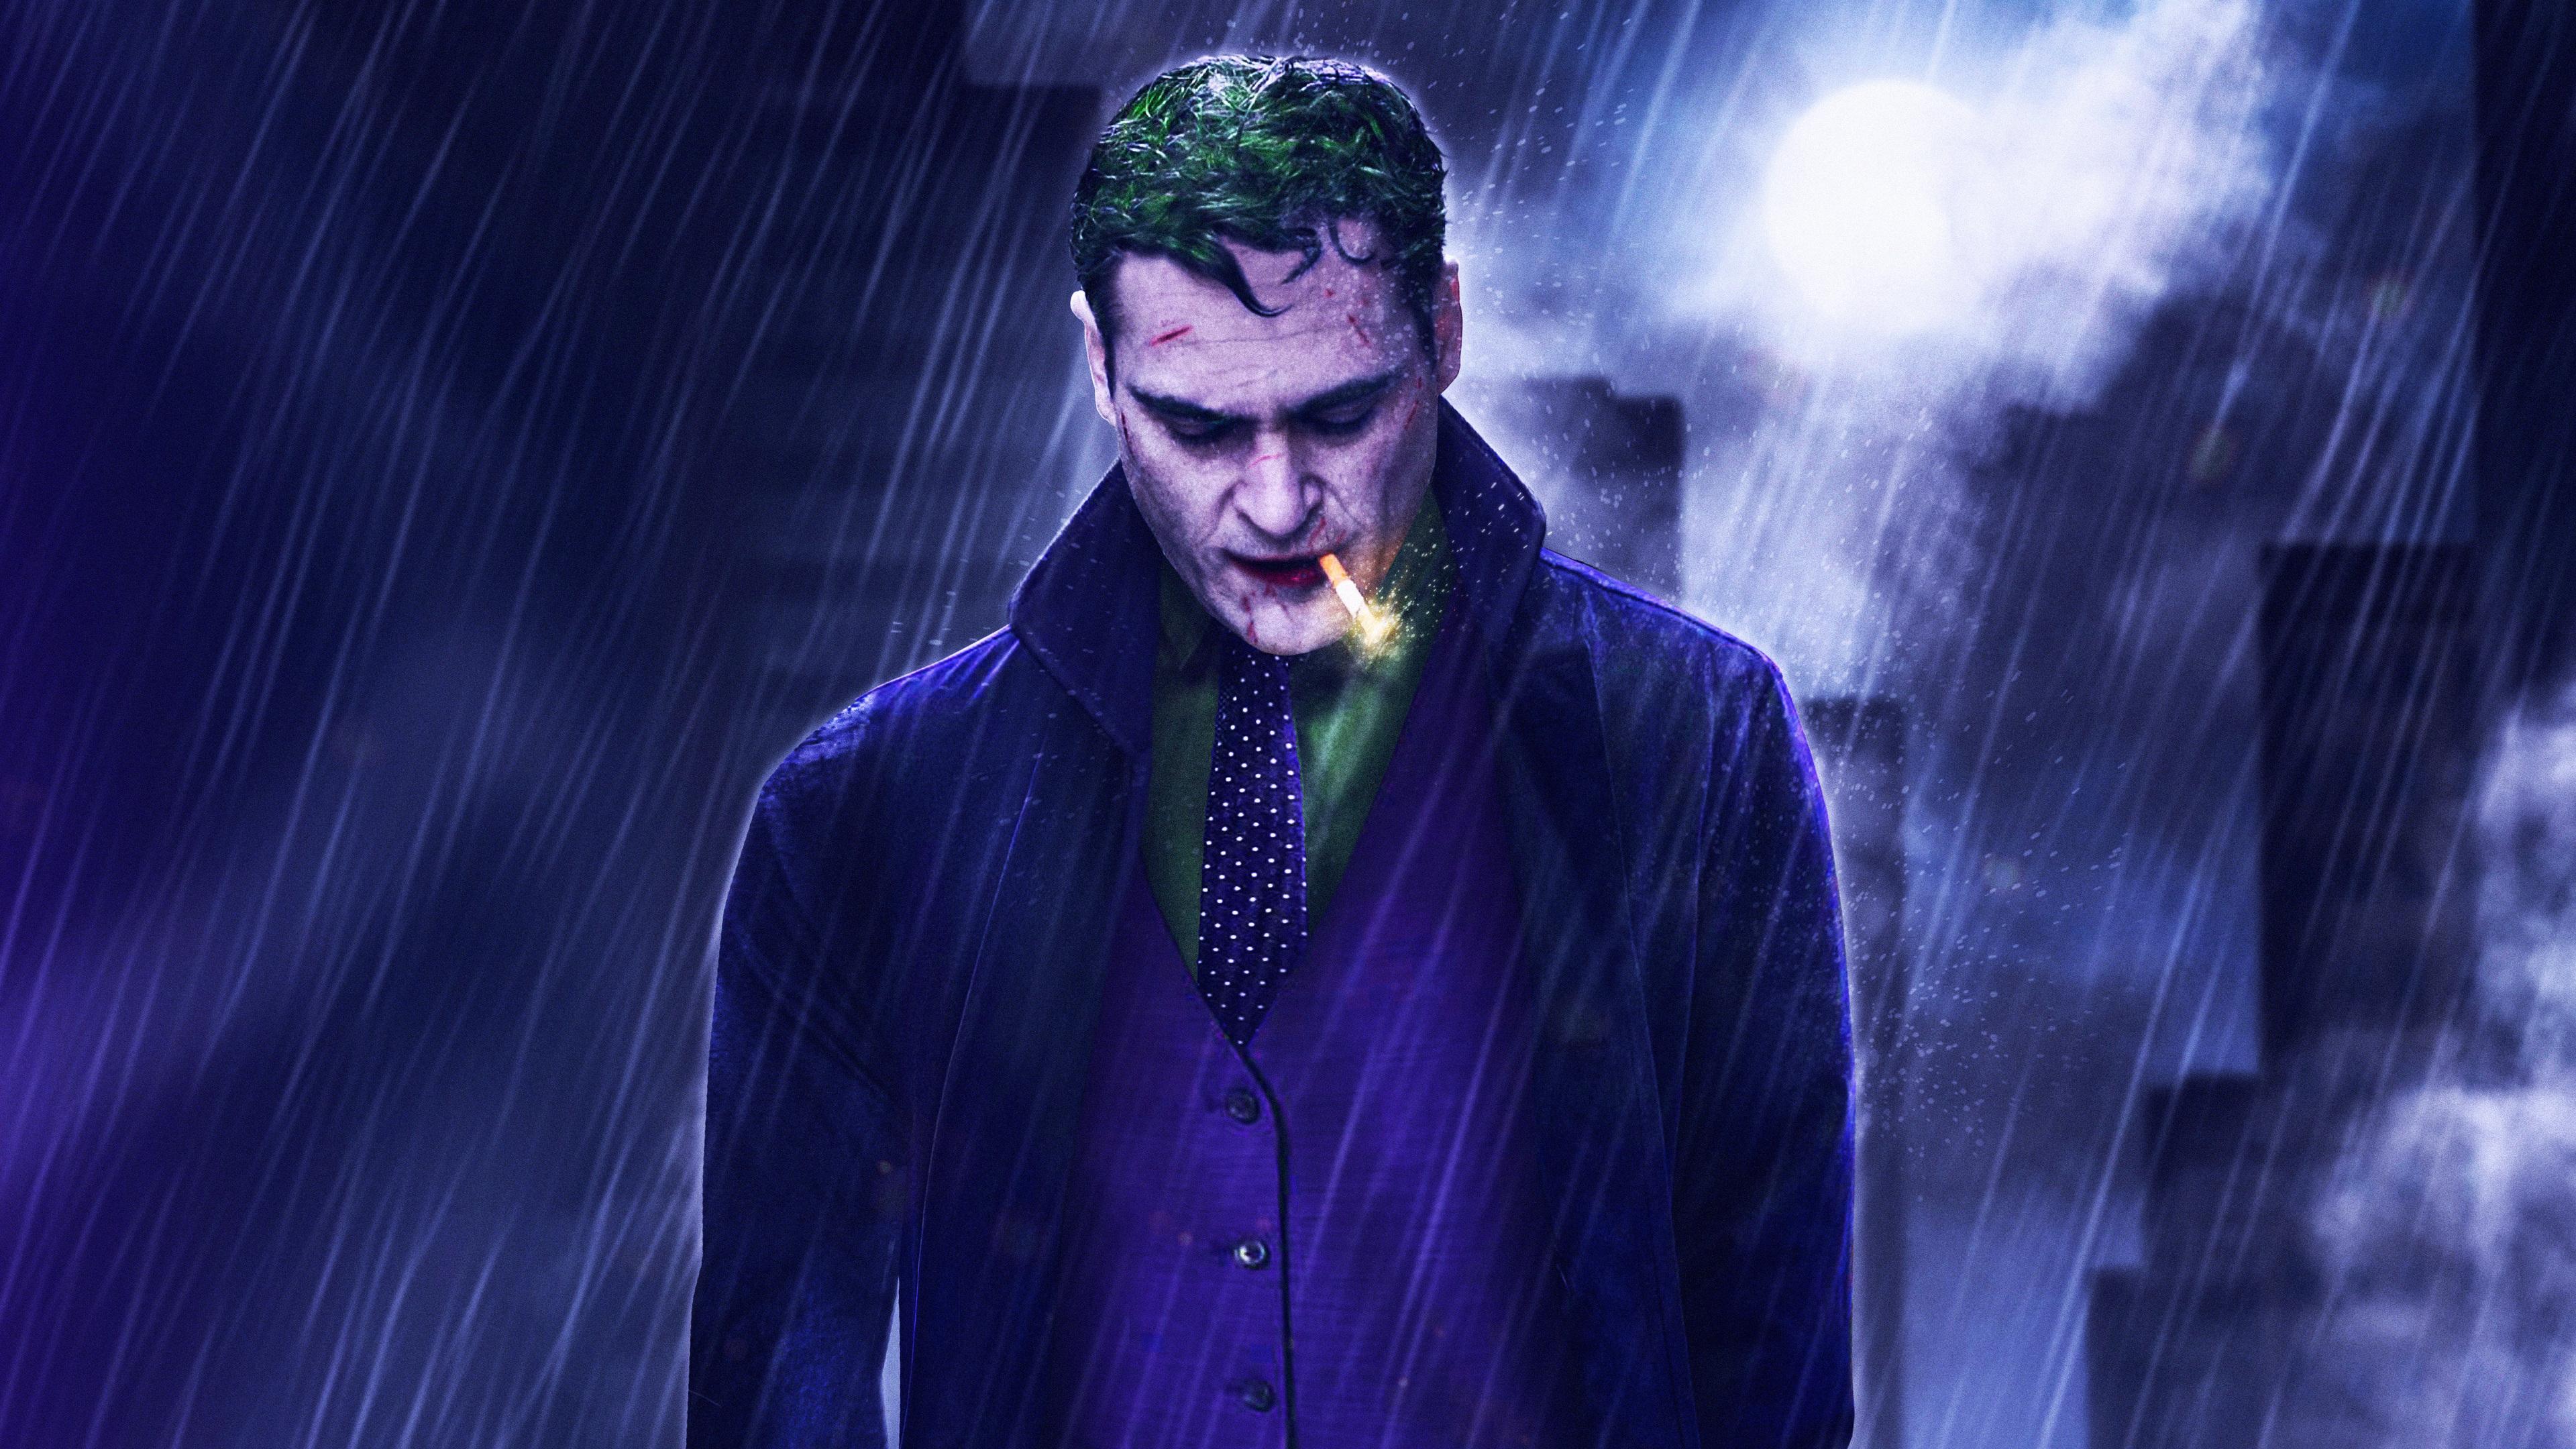 Wallpaper 4k Joaquin Phoenix Joker 2019 Movie 5k 2019 Movies